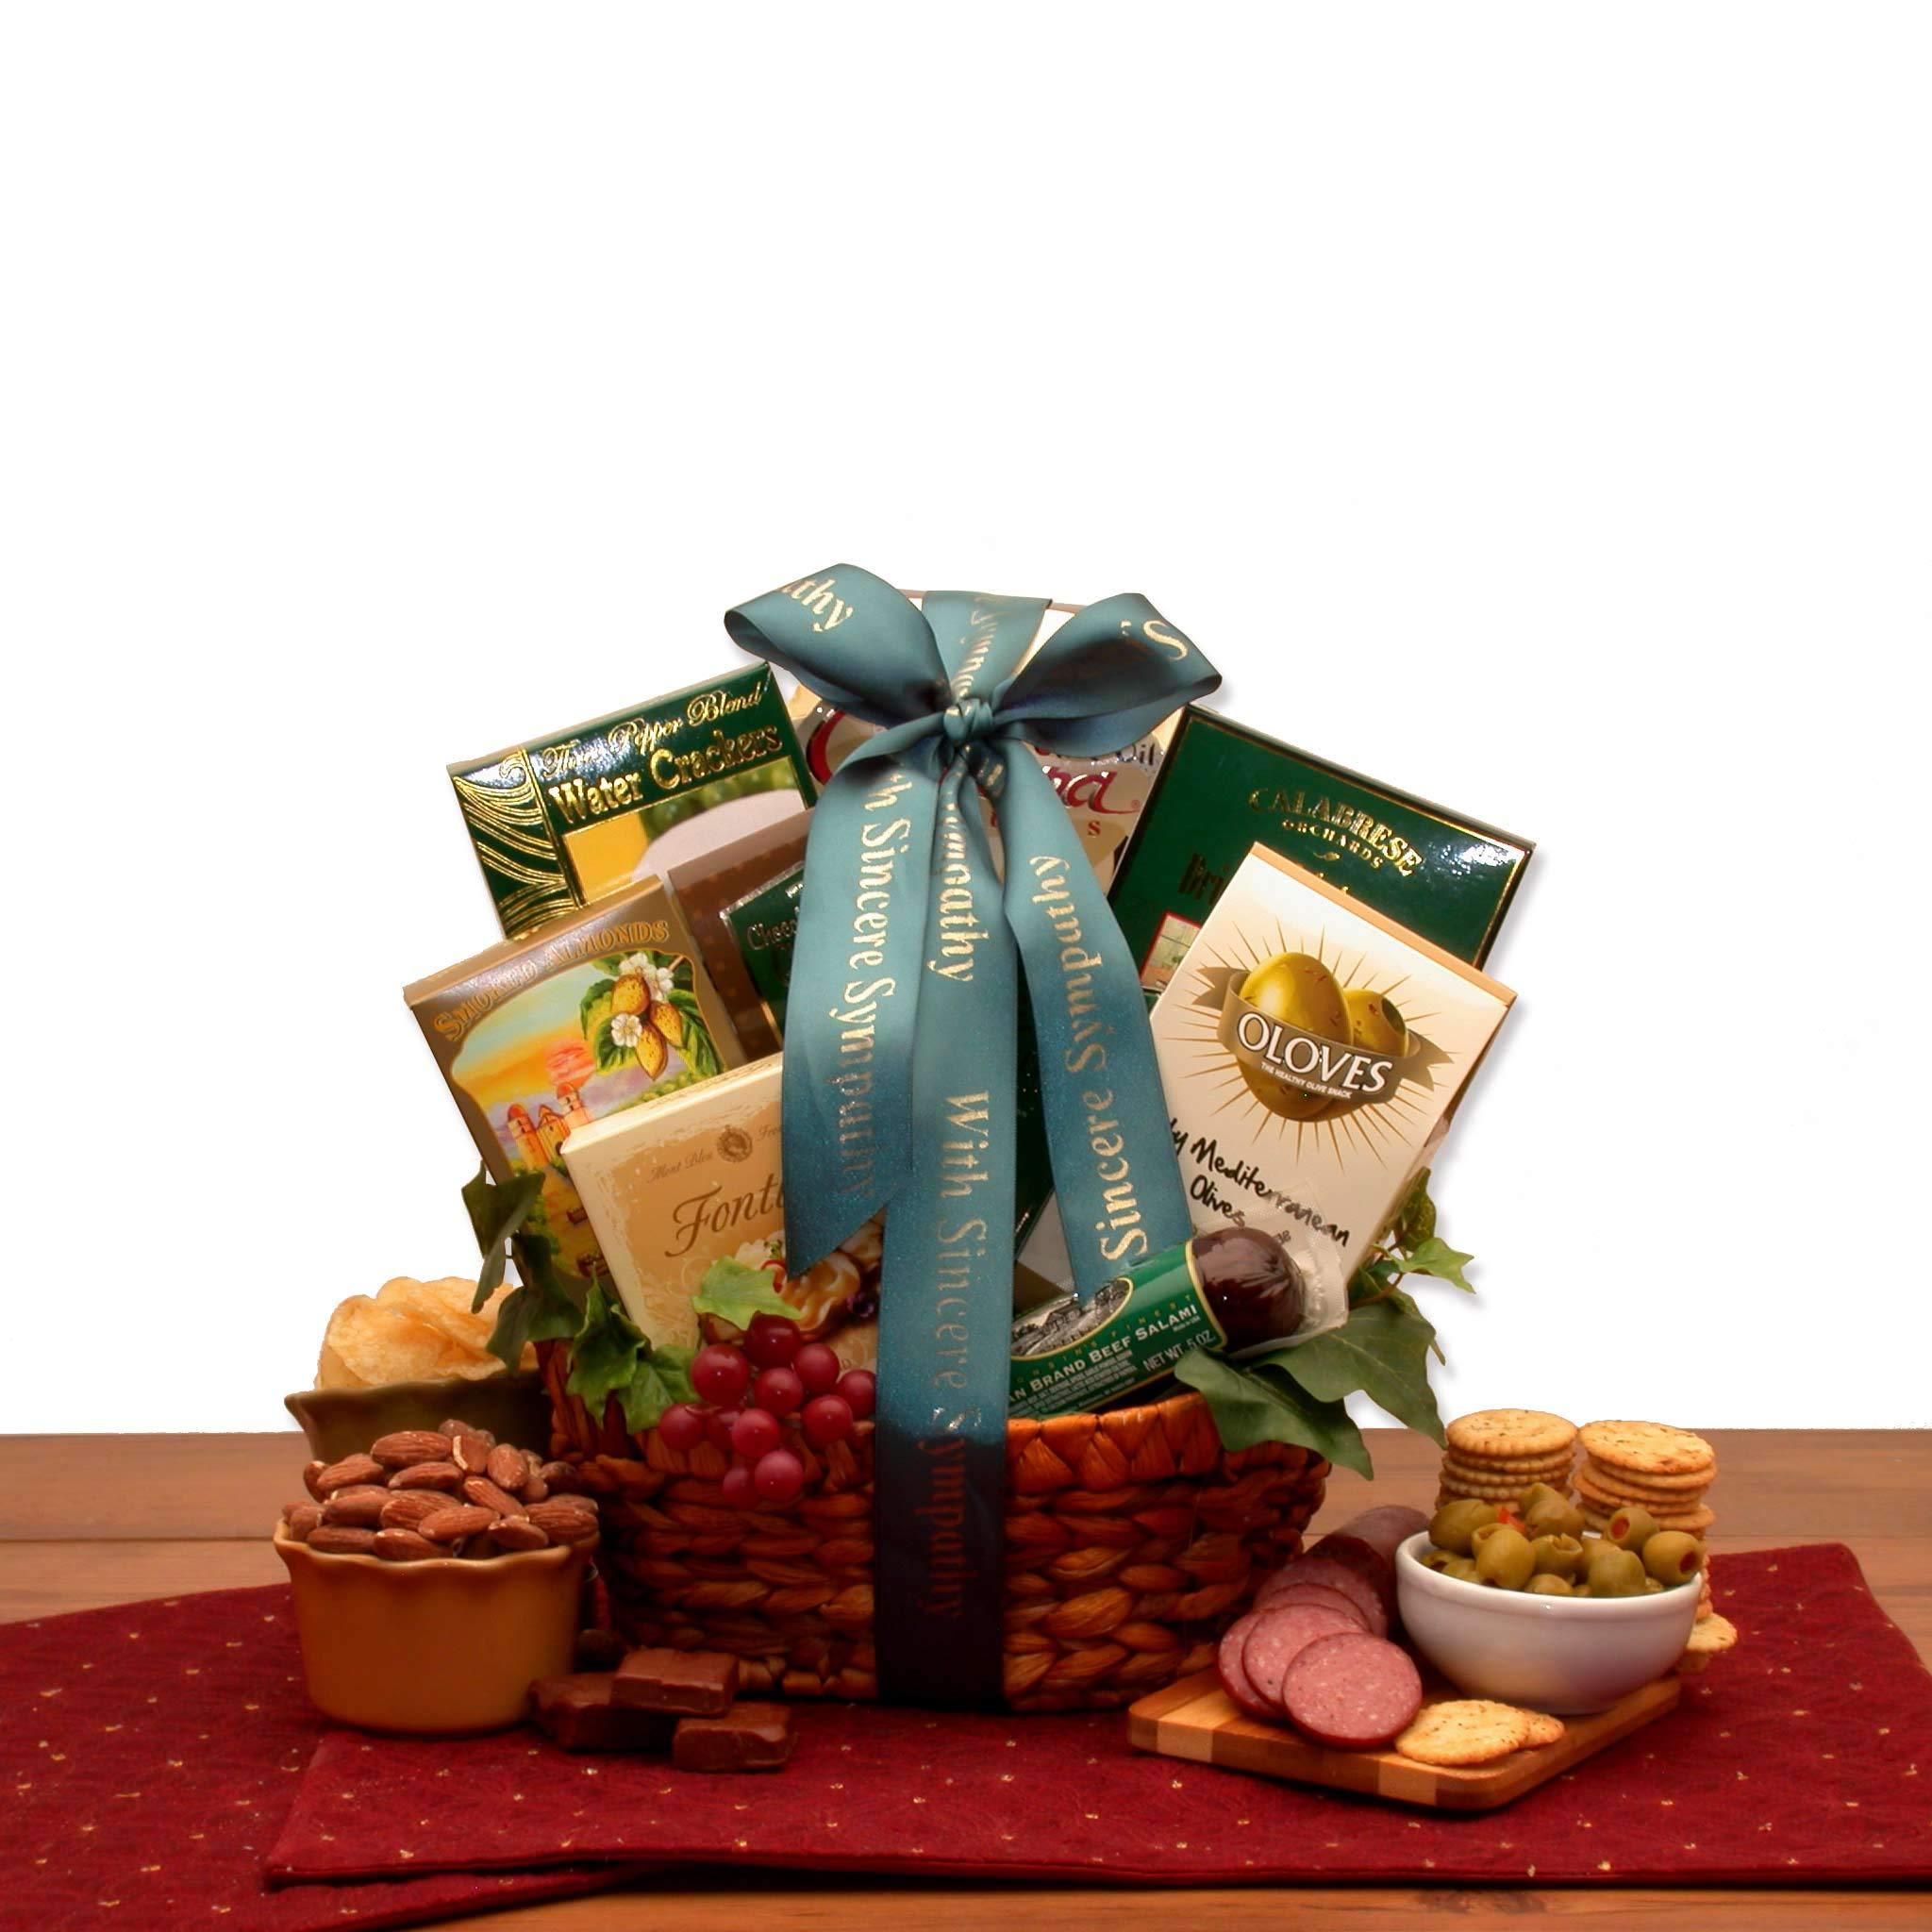 In Loving Memory Sympathy Gift Baskets